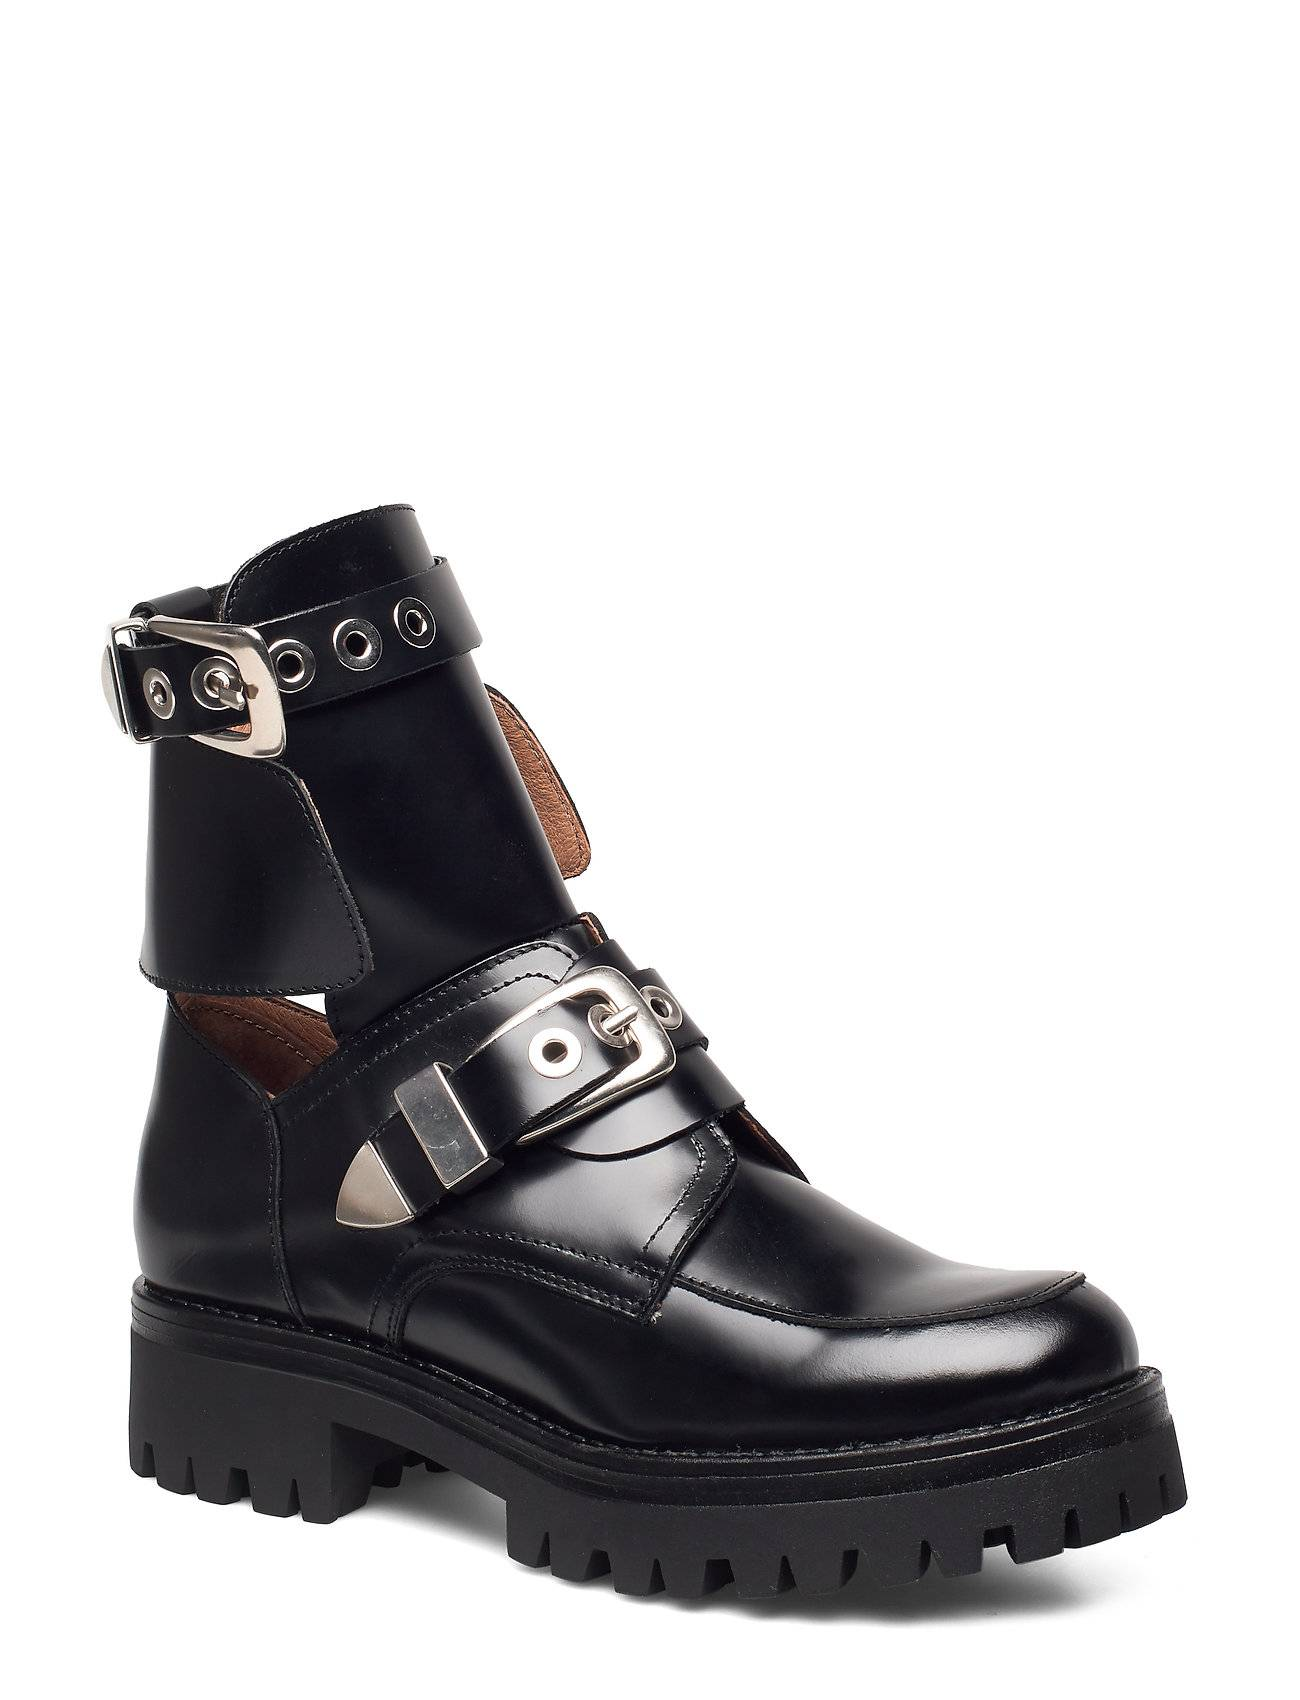 Henry Kole Melanie High Shine Black Shoes Boots Ankle Boots Ankle Boots Flat Heel Musta Henry Kole